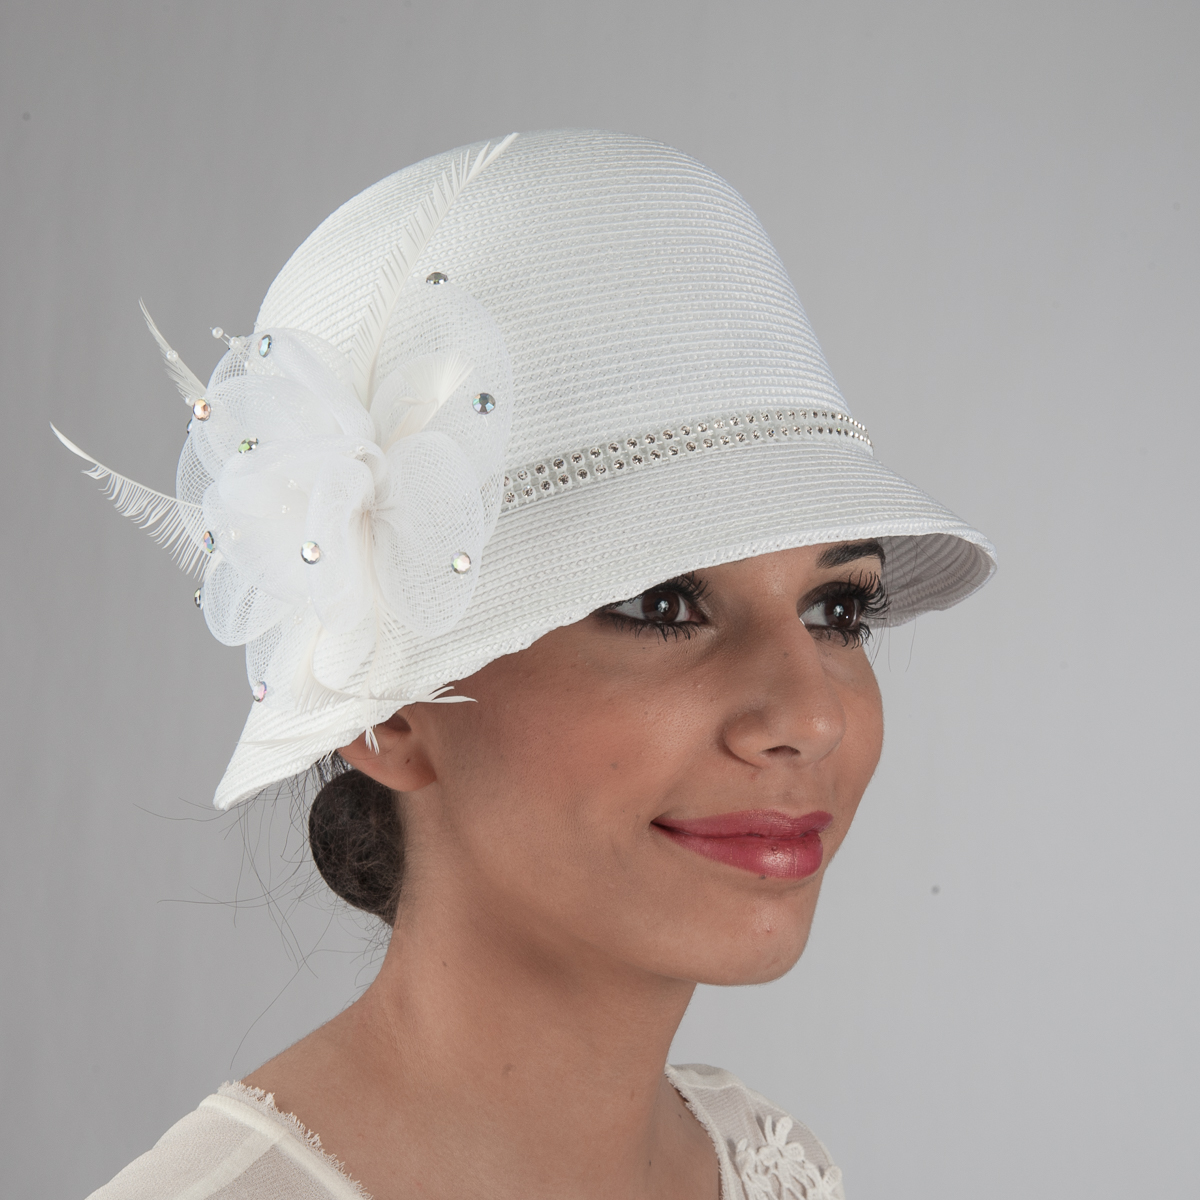 3d5288d97ea8b White Rhinestone Band Crinoline Bow Cloche Hats-301767-WT- Sun Yorkos